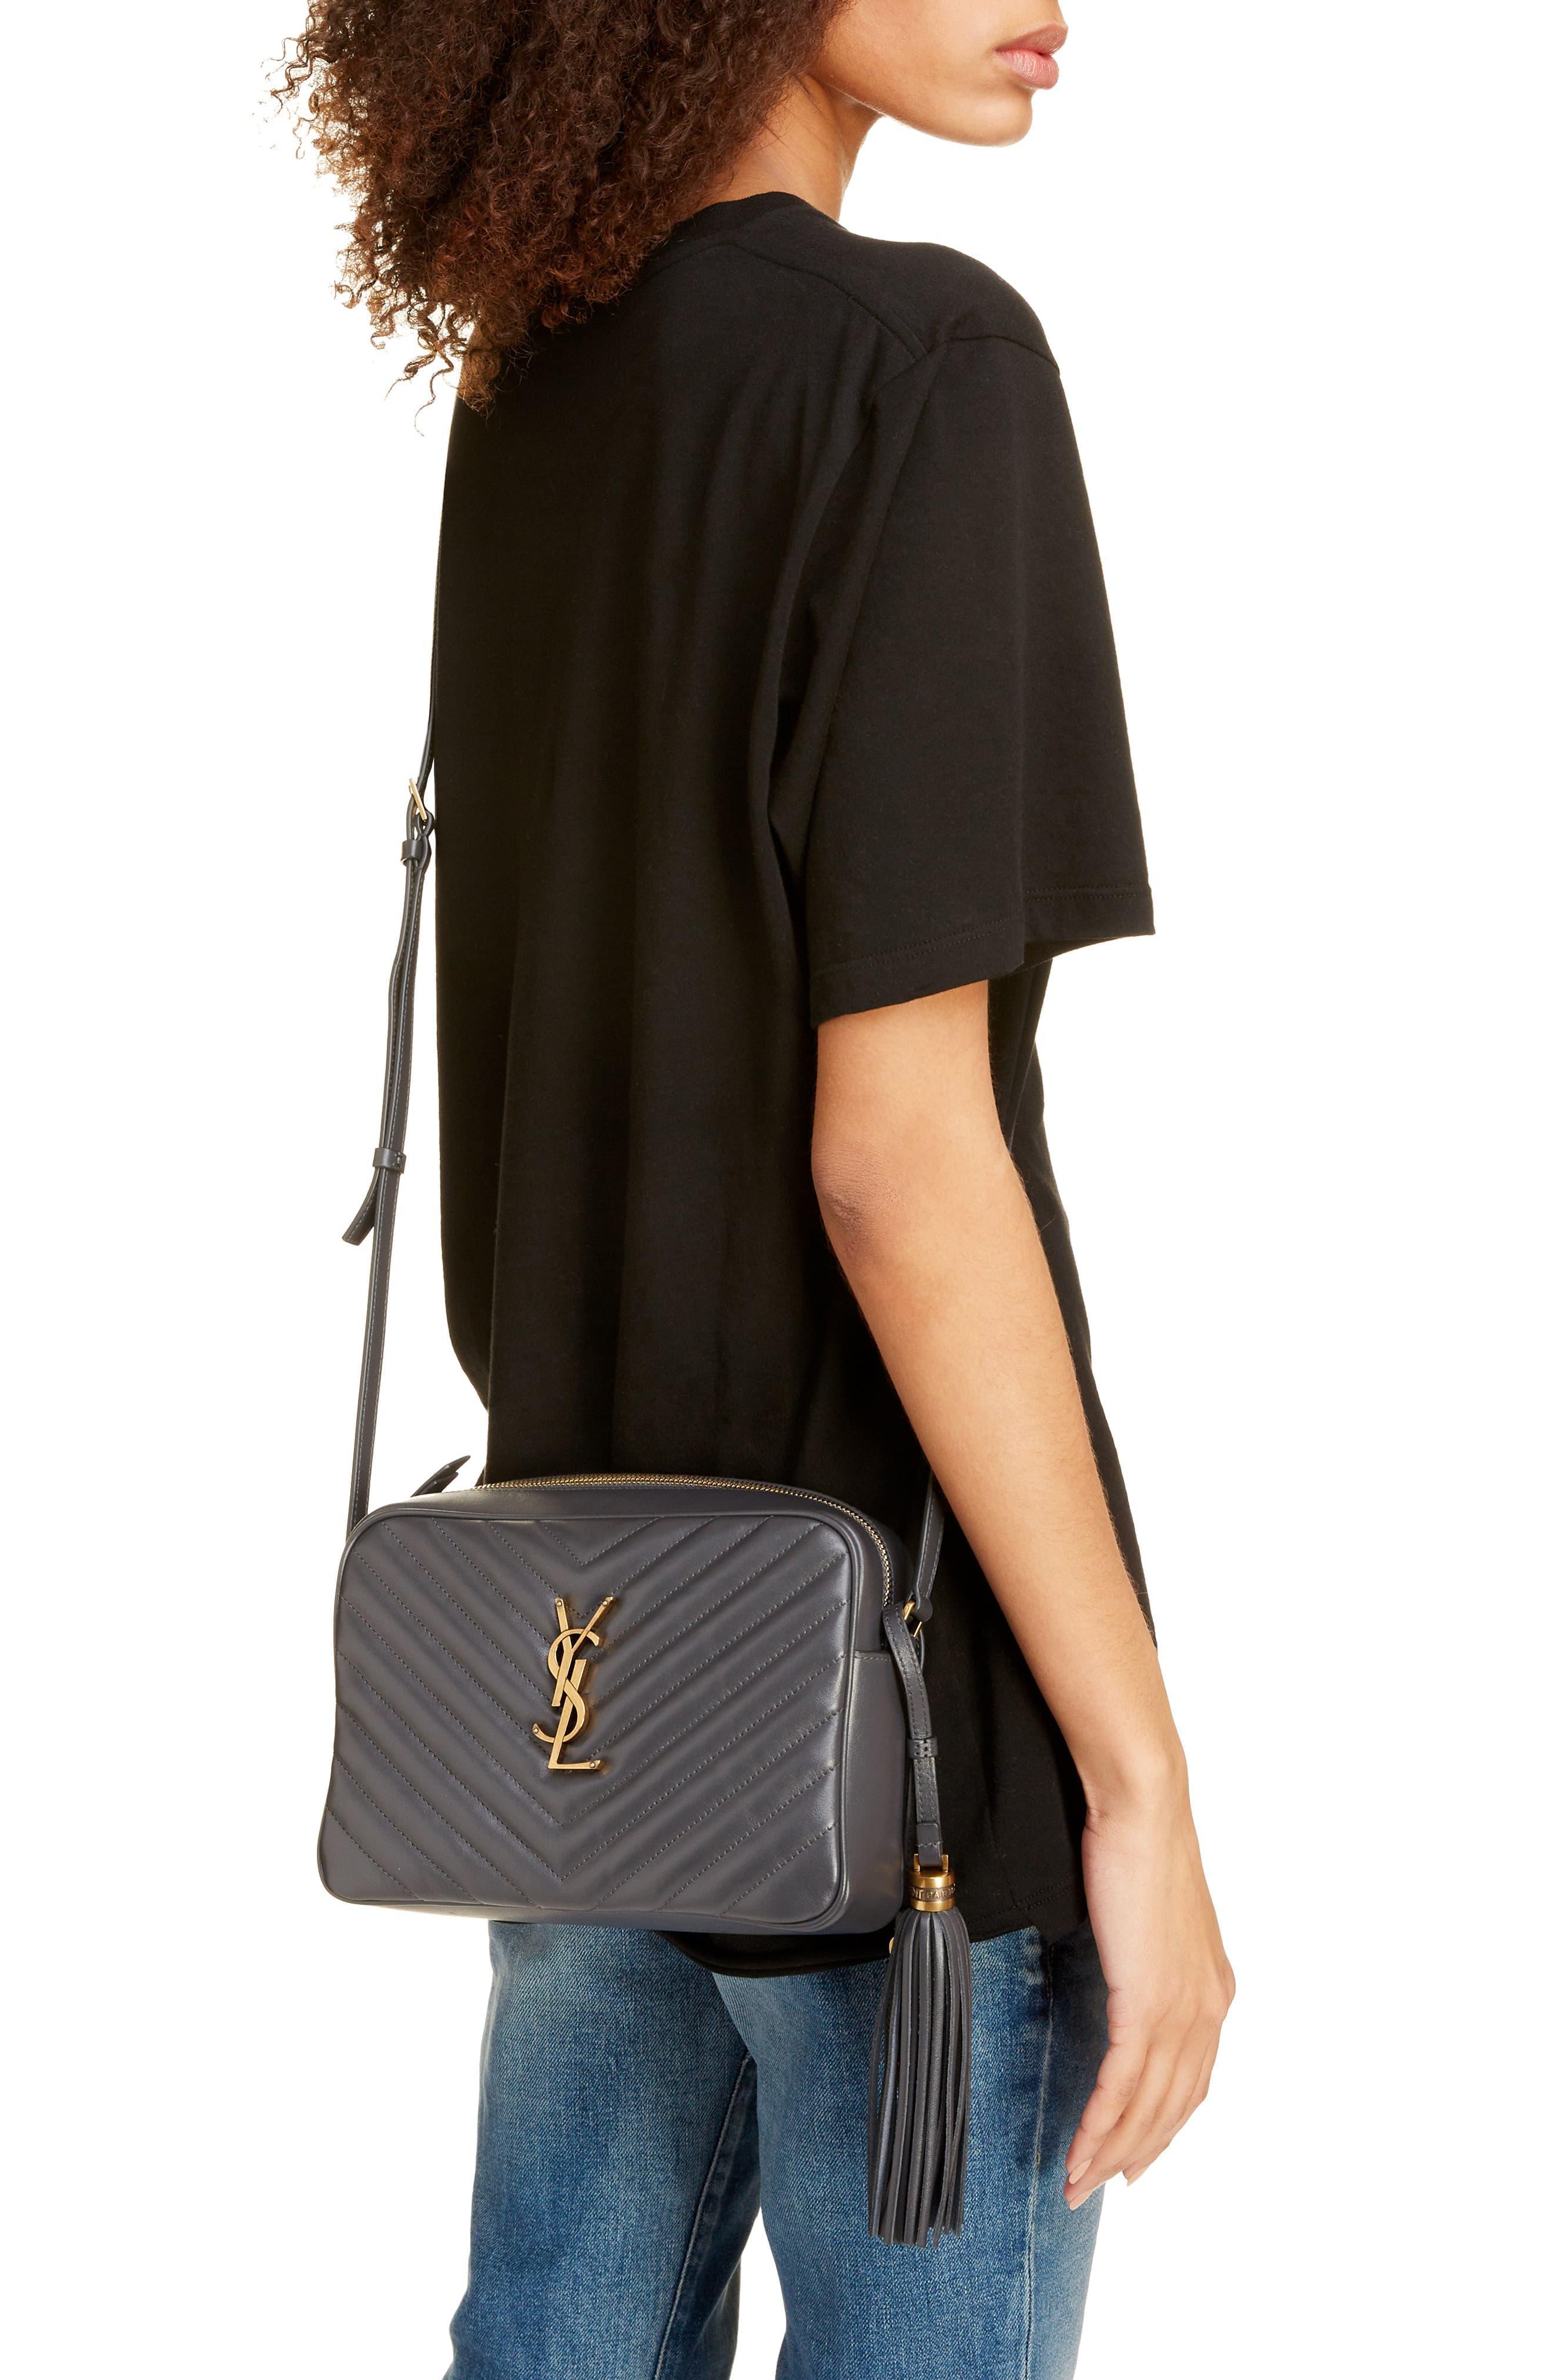 Lou Matelassé Leather Camera Bag